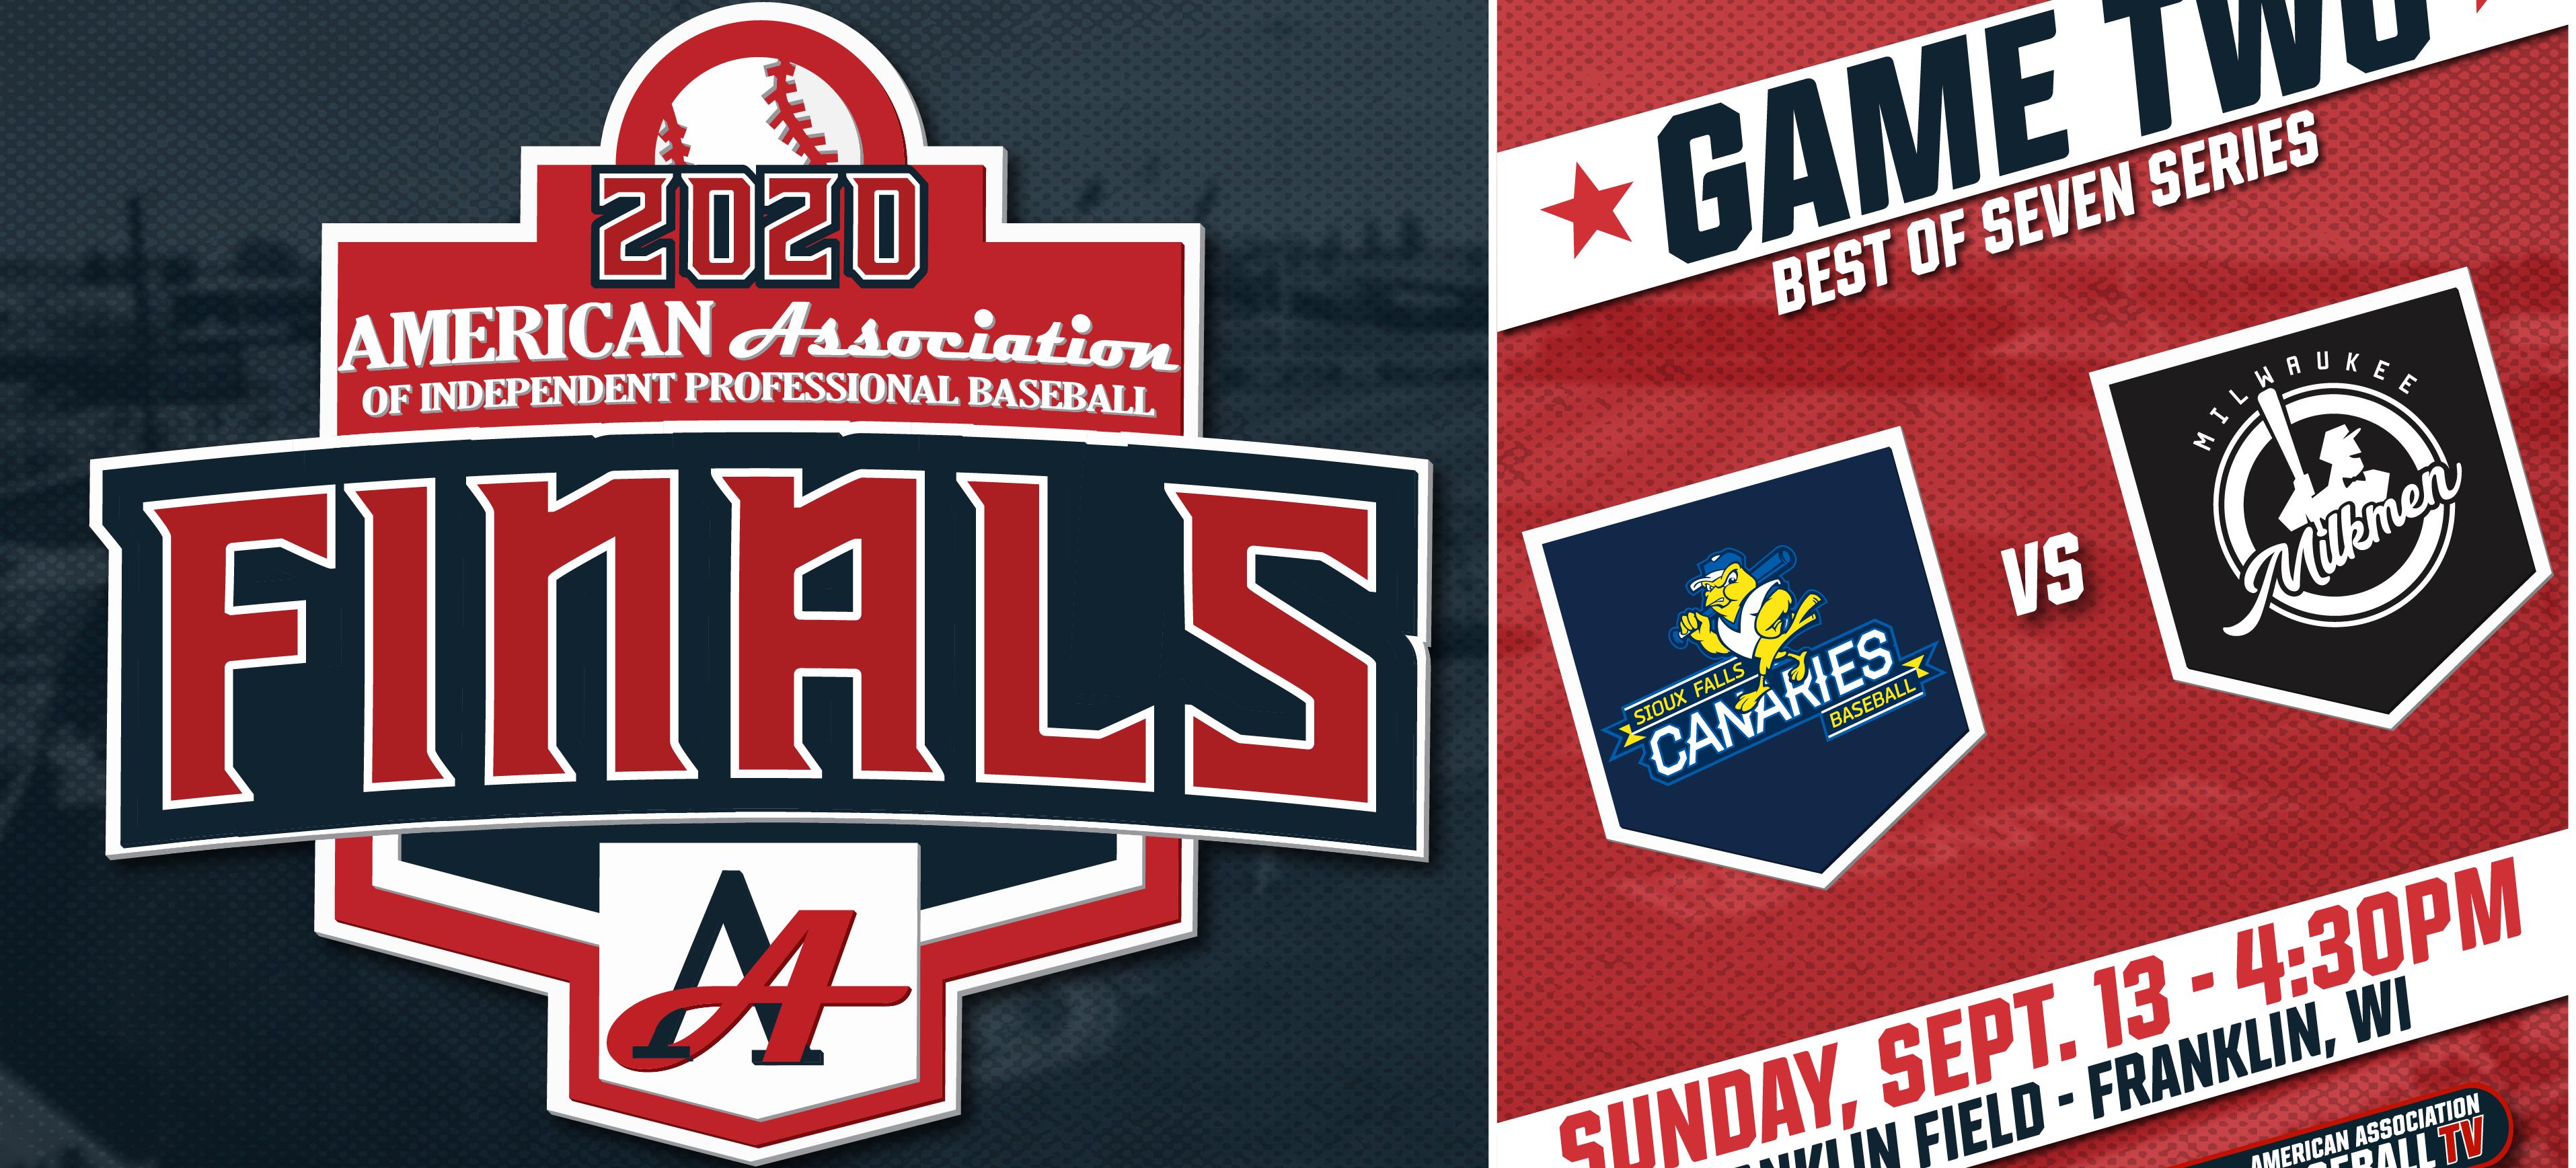 2020 Aa Finals Vimeo Live Game